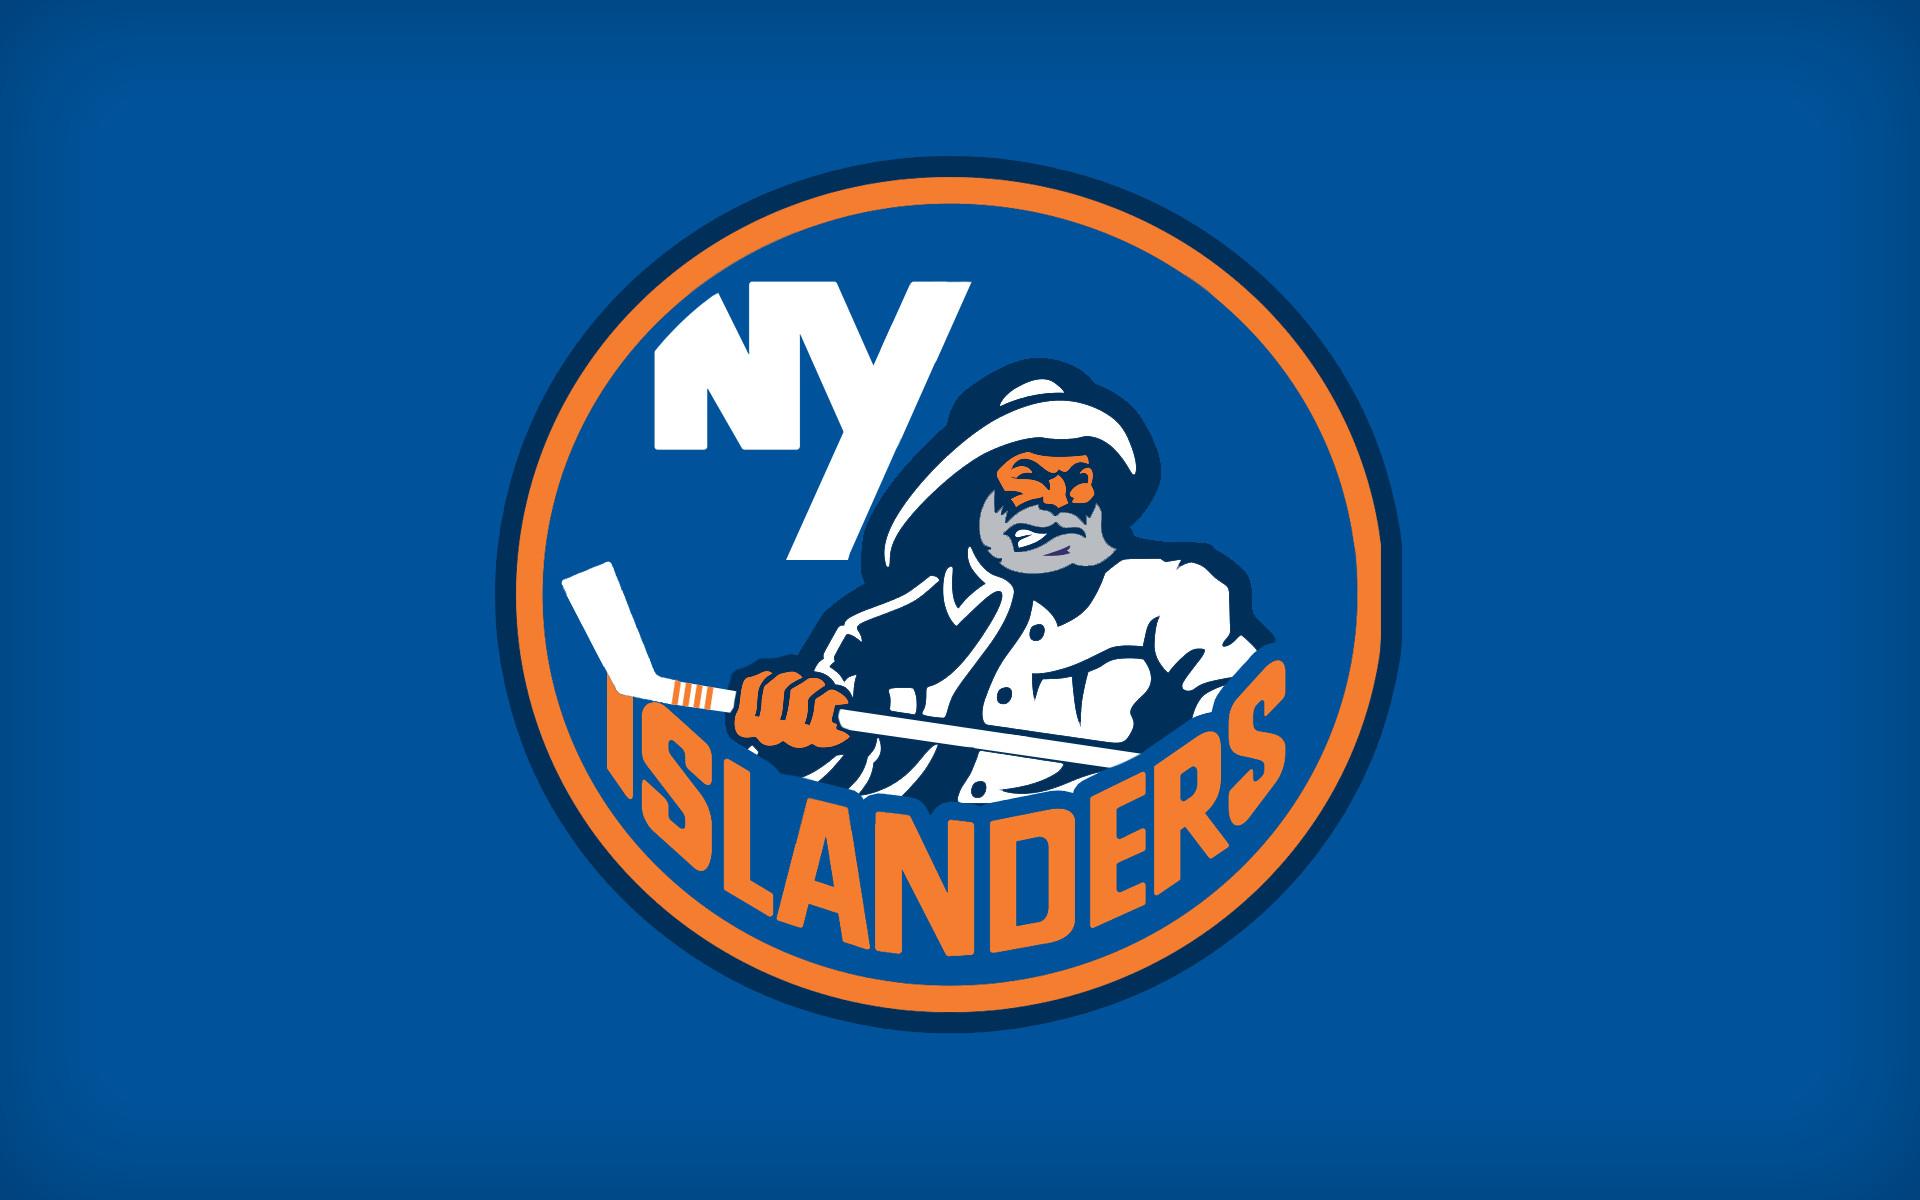 New York Islanders Wallpaper